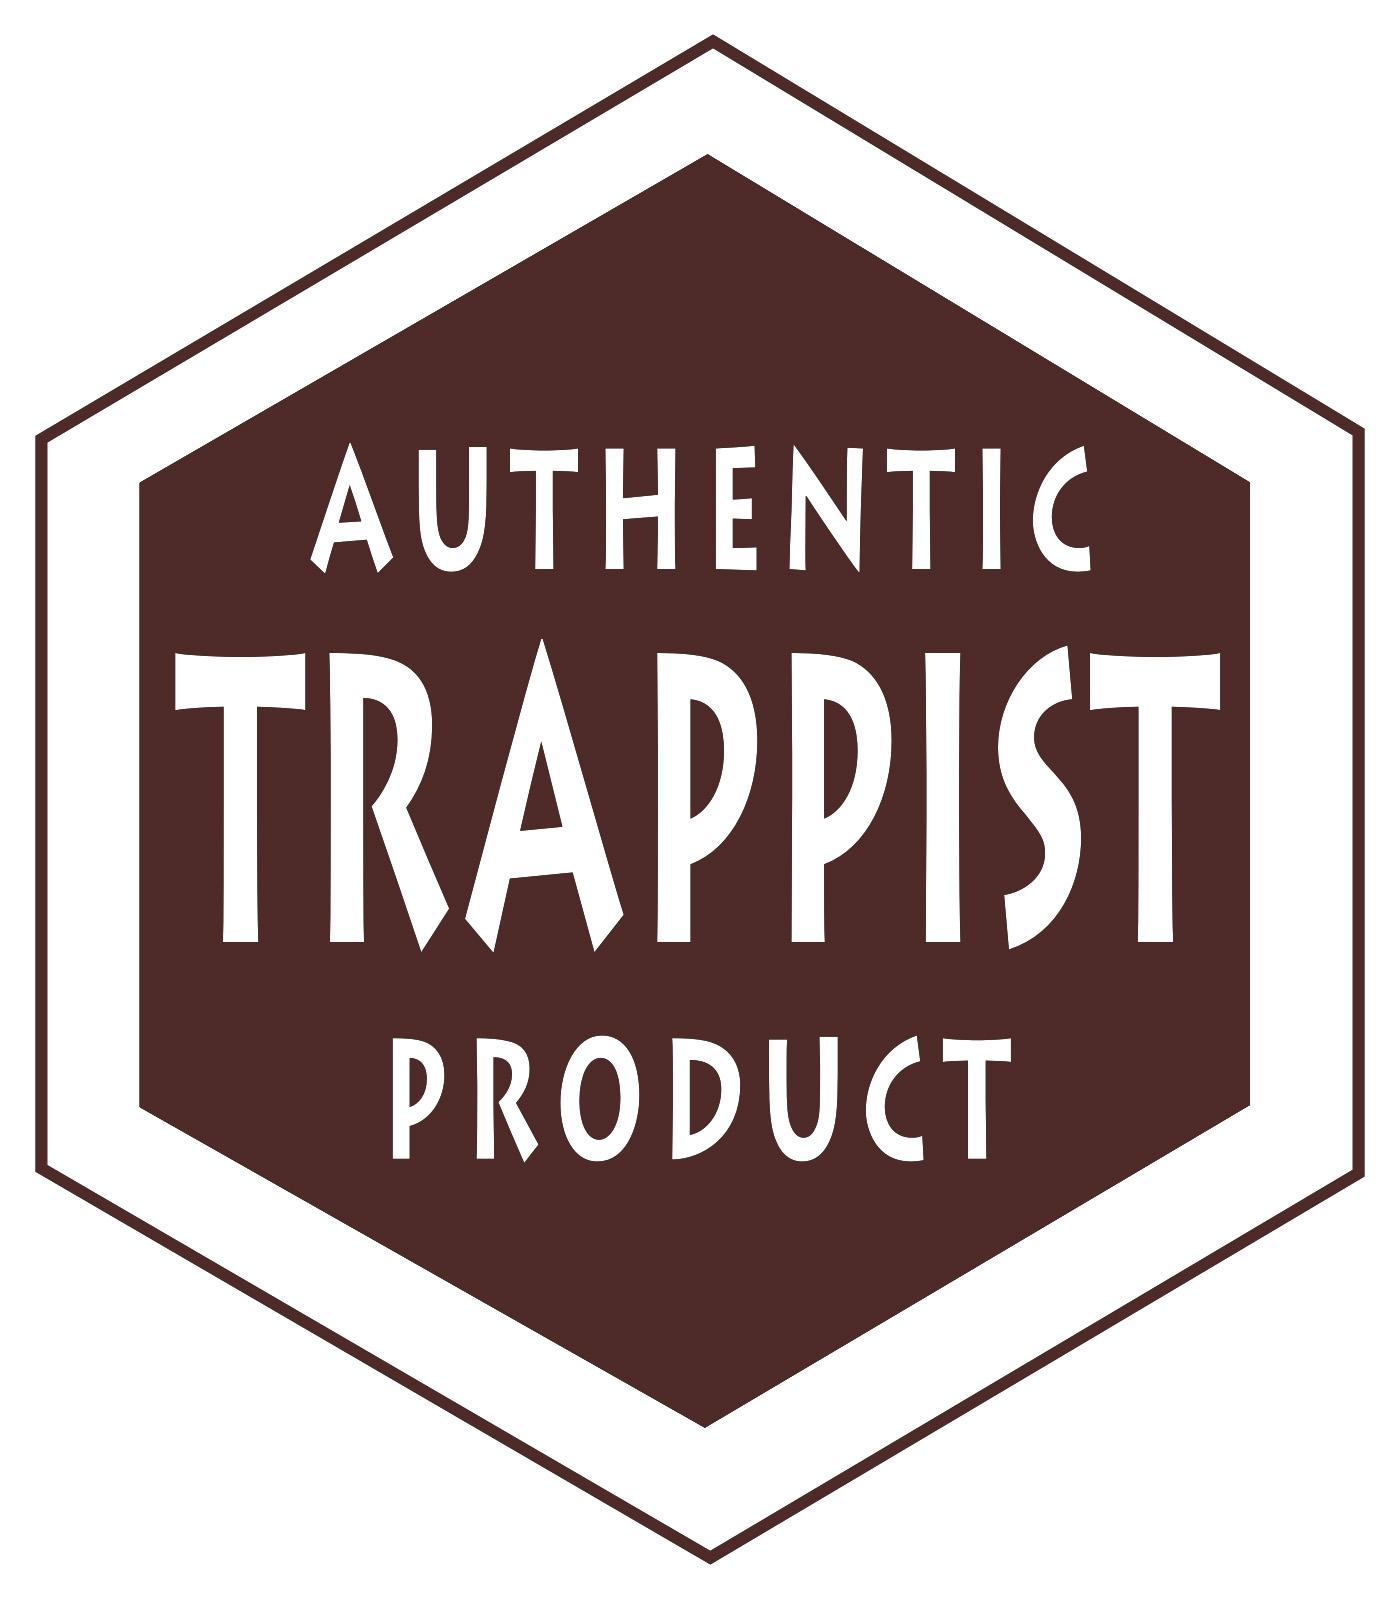 2012-08-12-trappistlogo.jpg